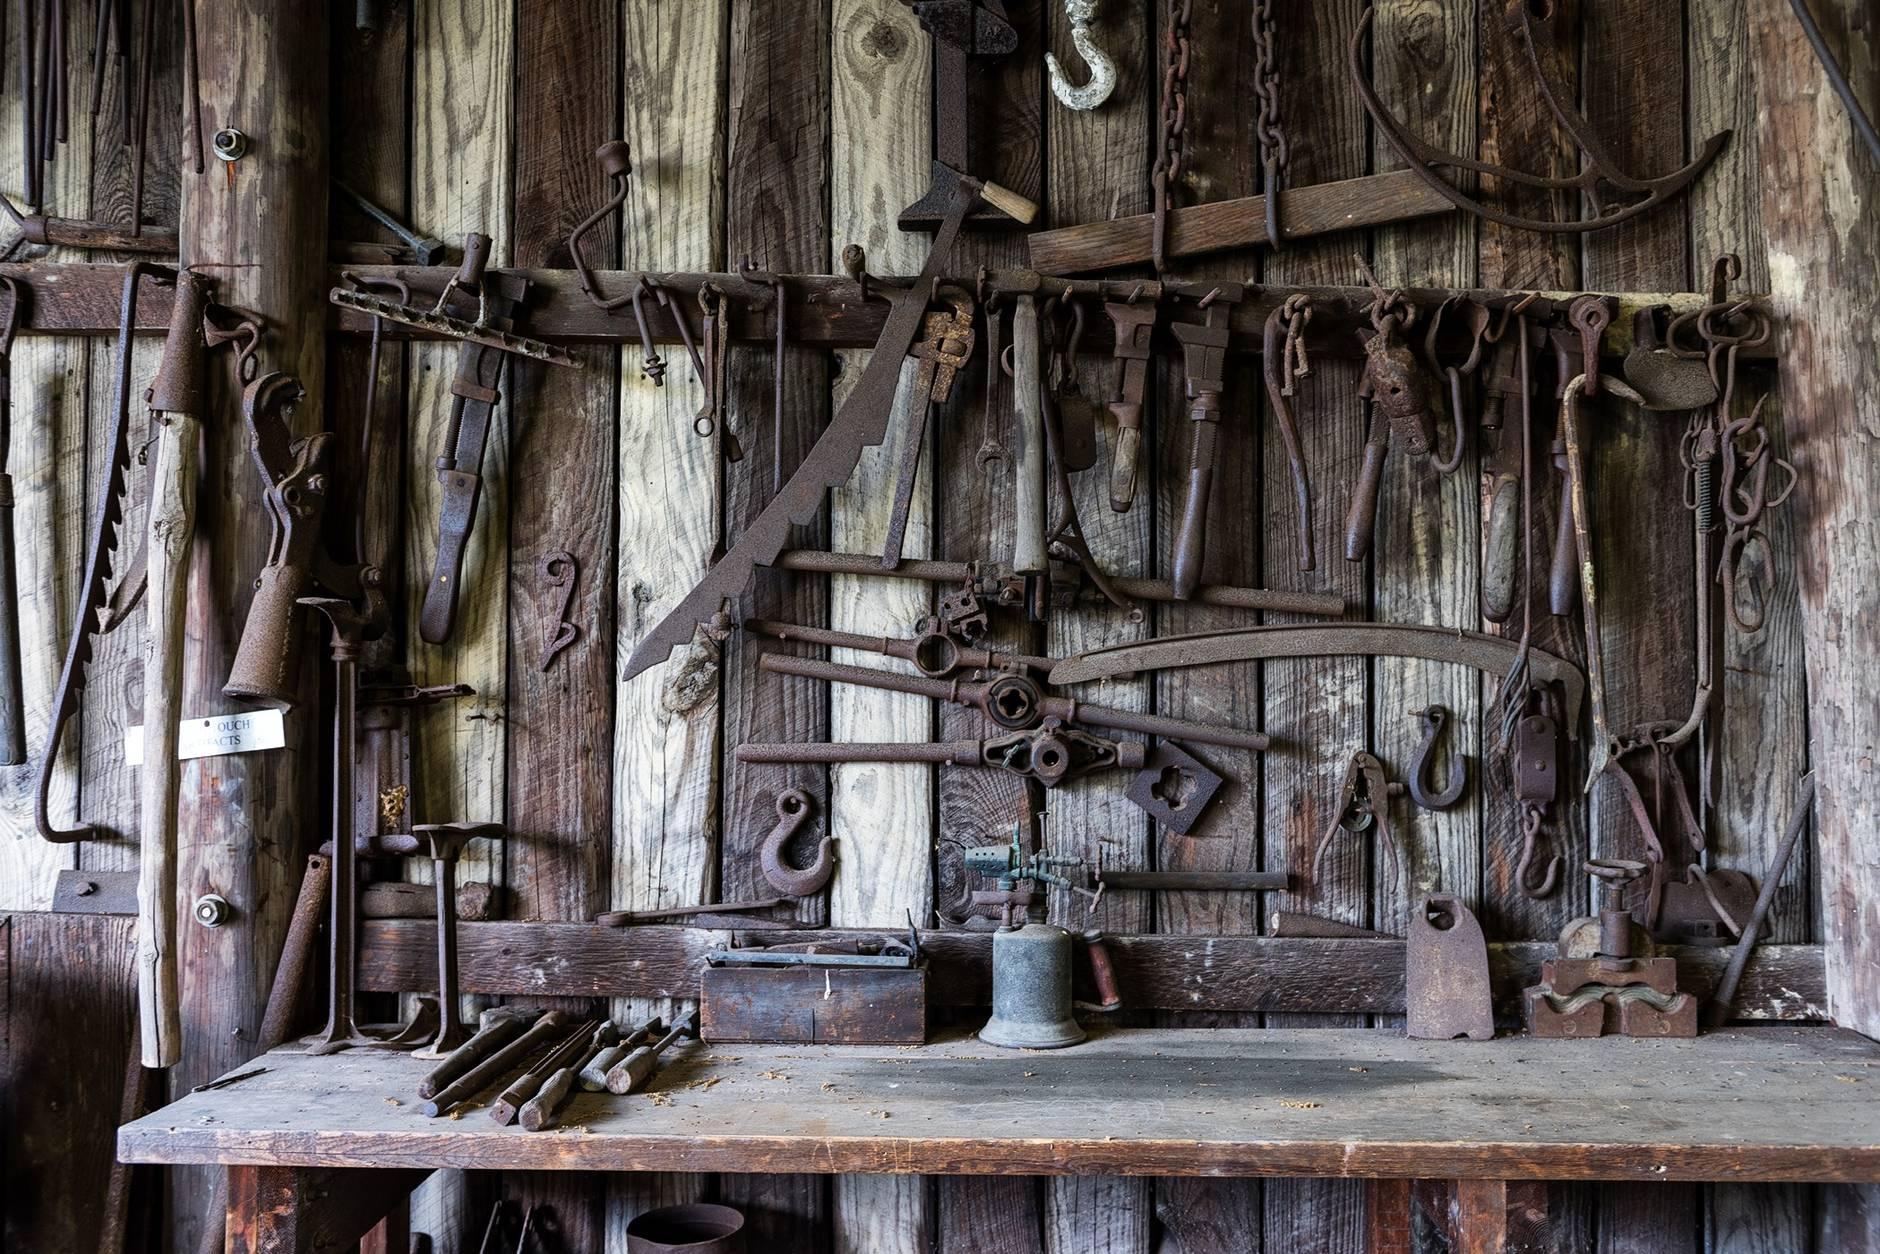 black metal tools hanged on a rack near table